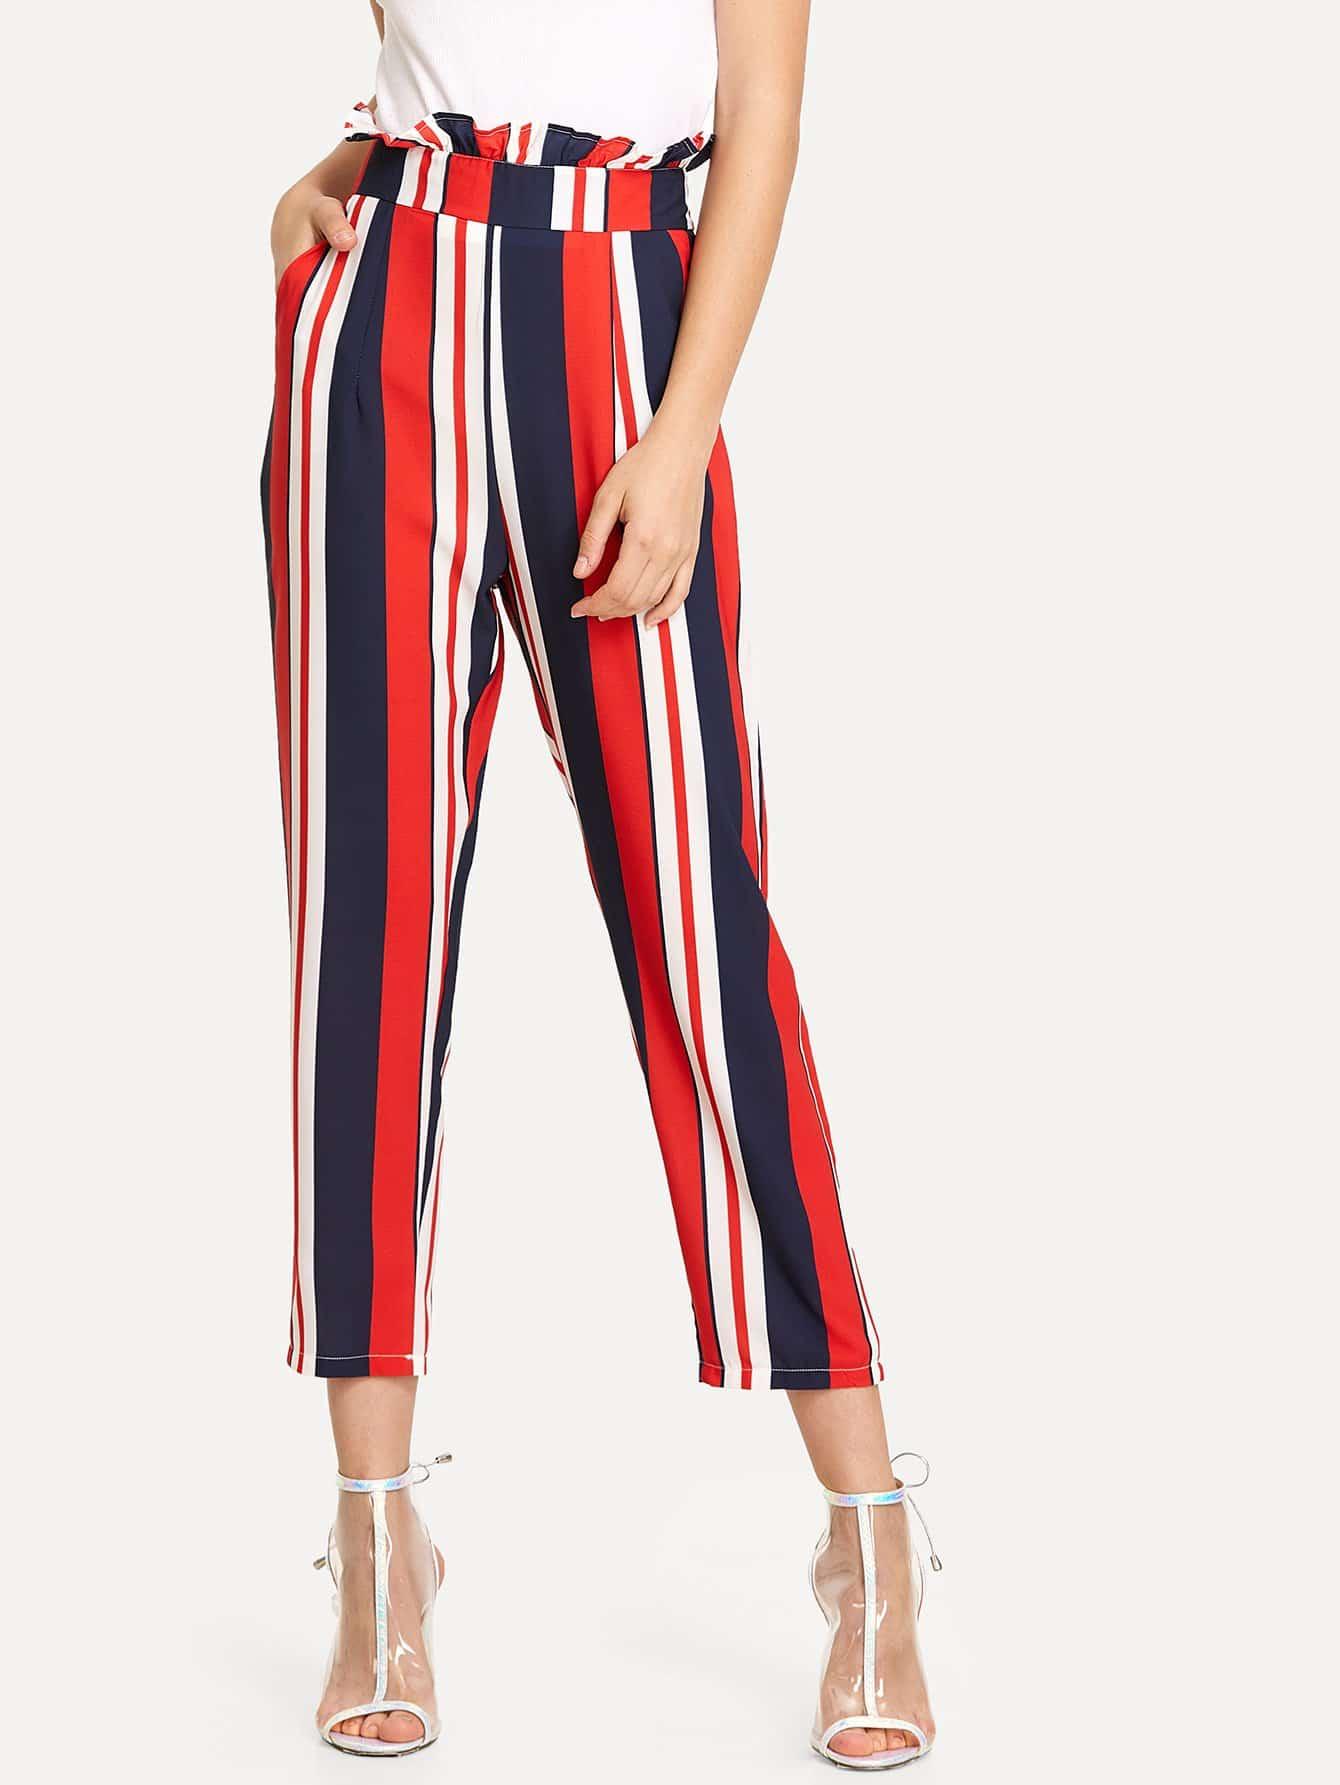 Frill Trim Zip Up Back Striped Pants zip back flared pants